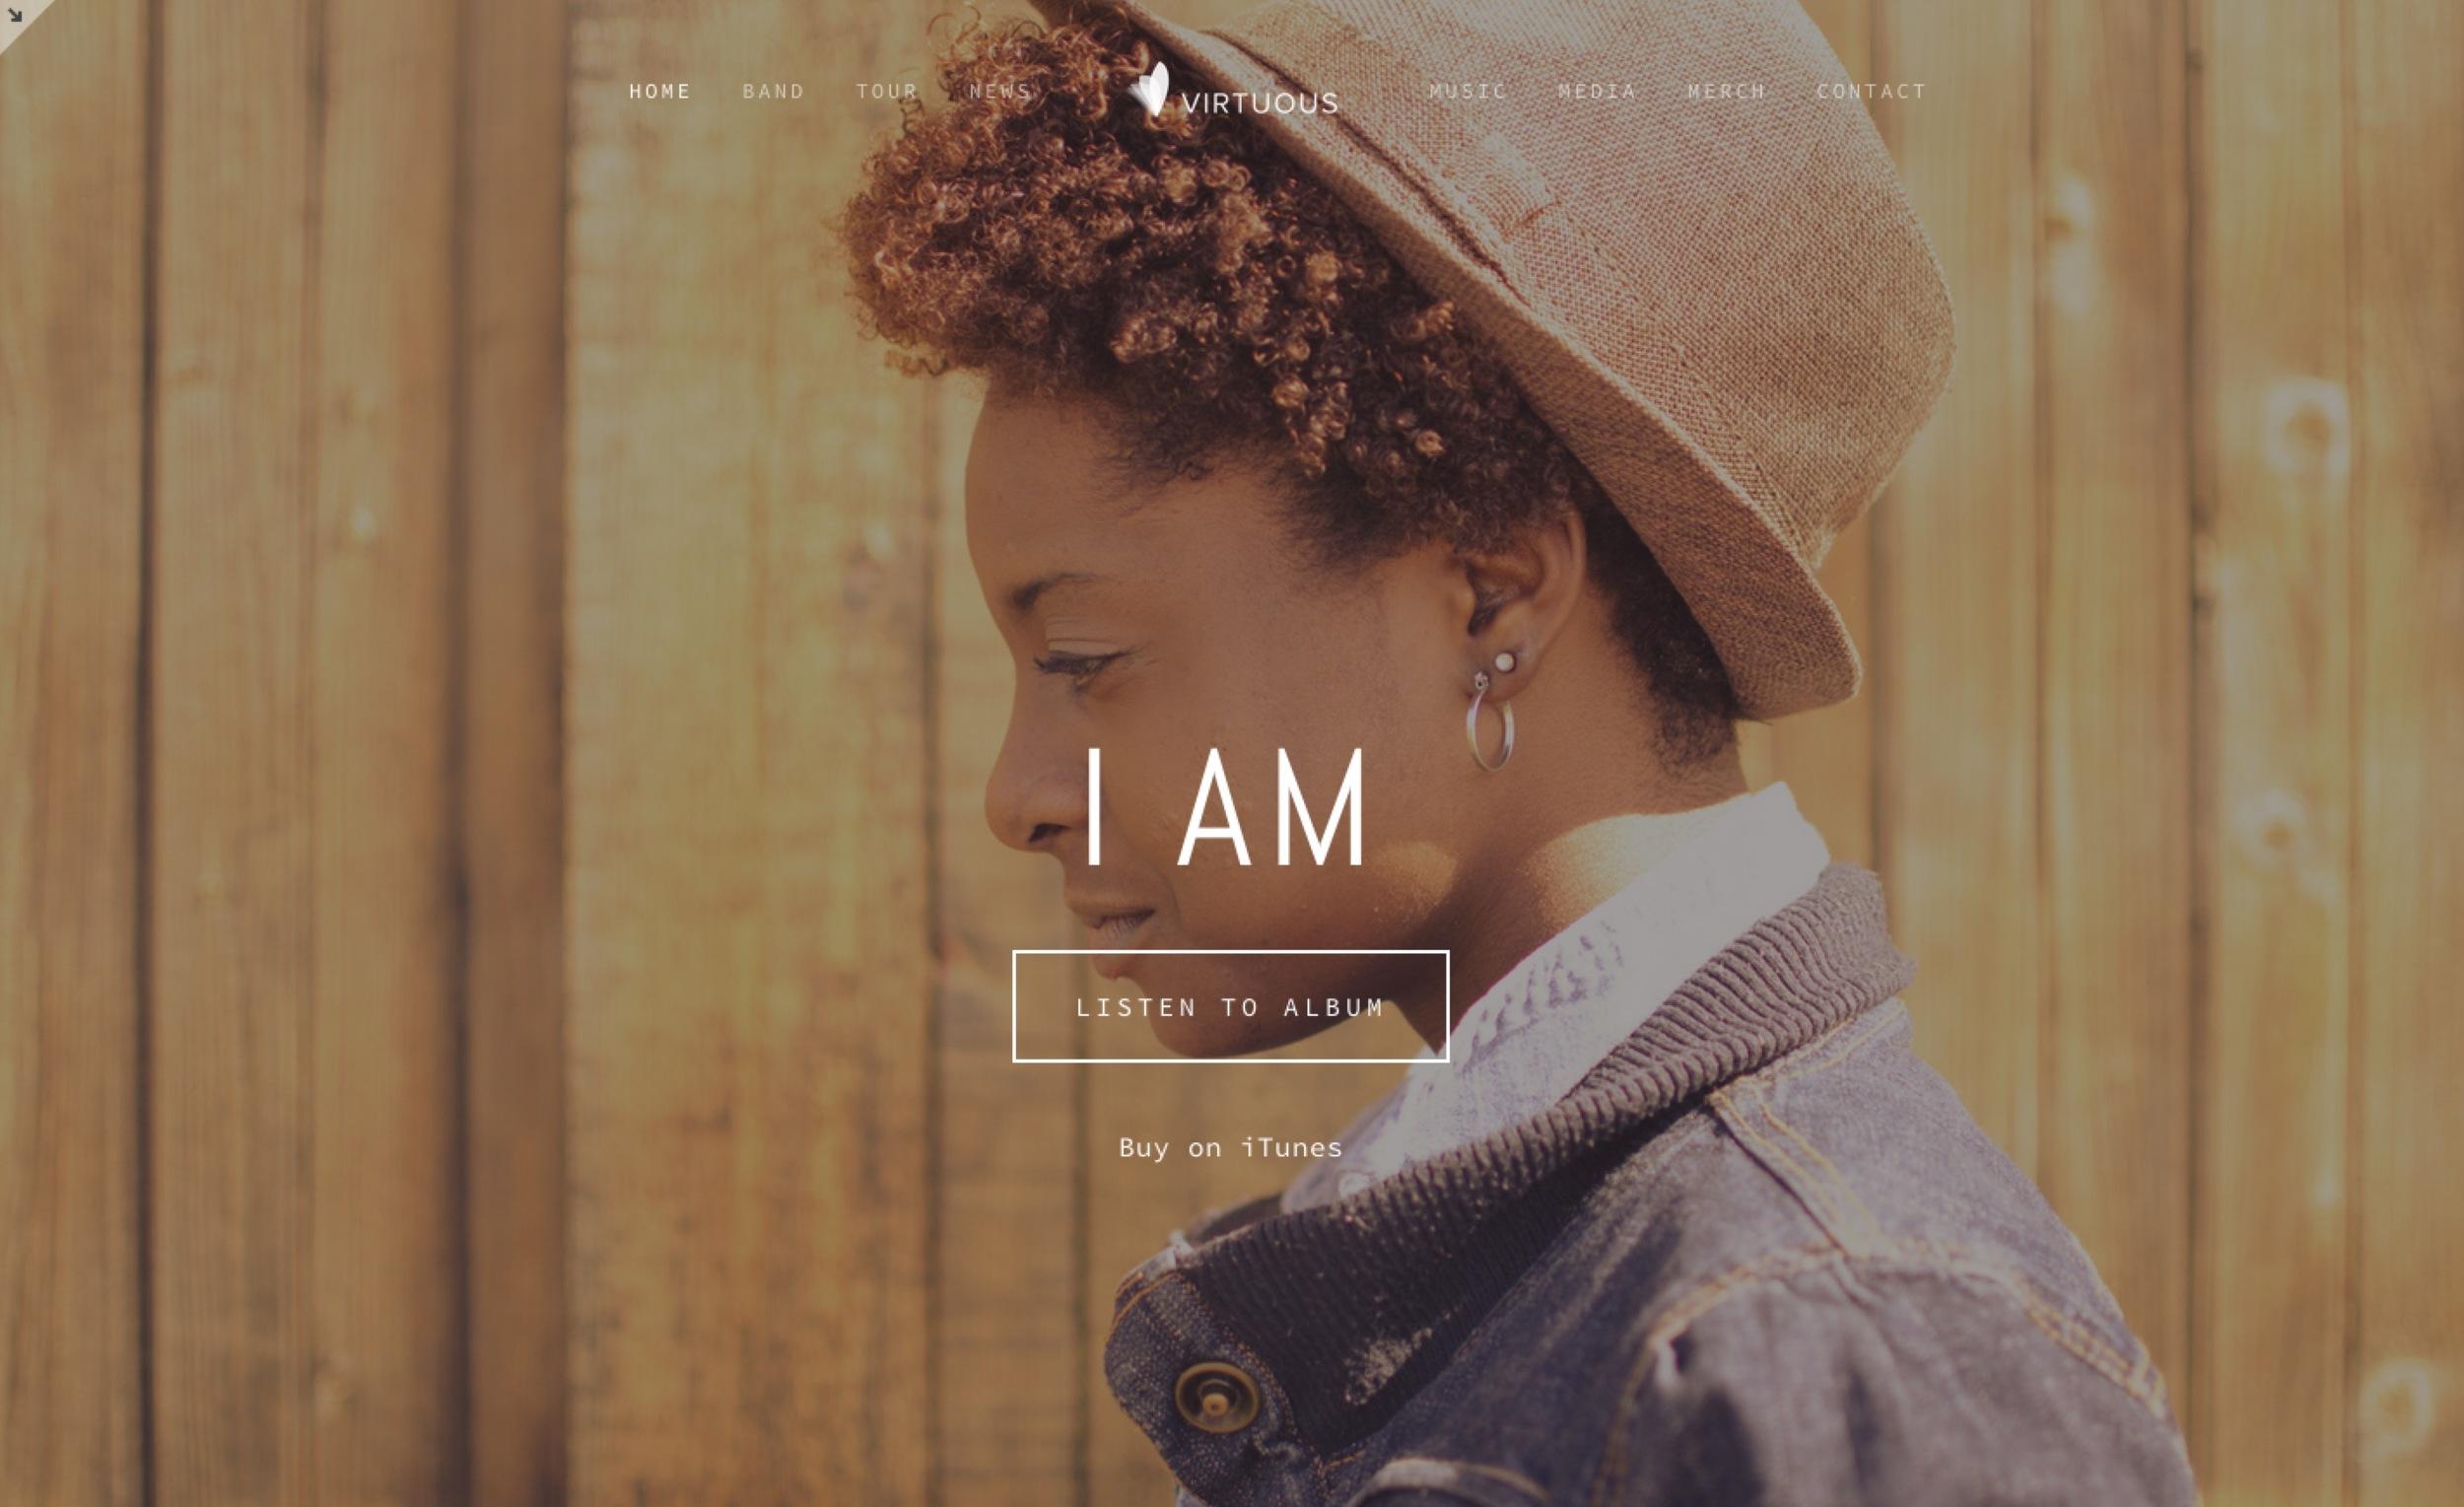 virtuous-website-home.jpg